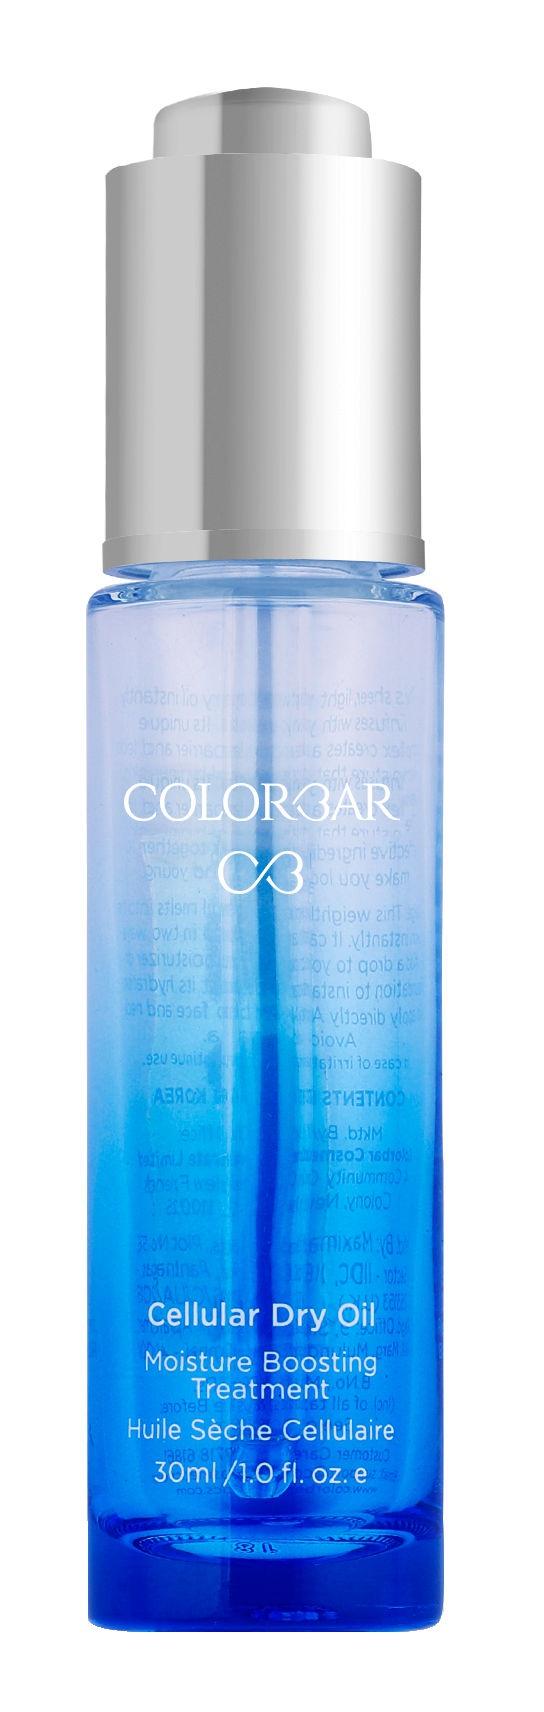 Colorbar Cellular Dry Oil